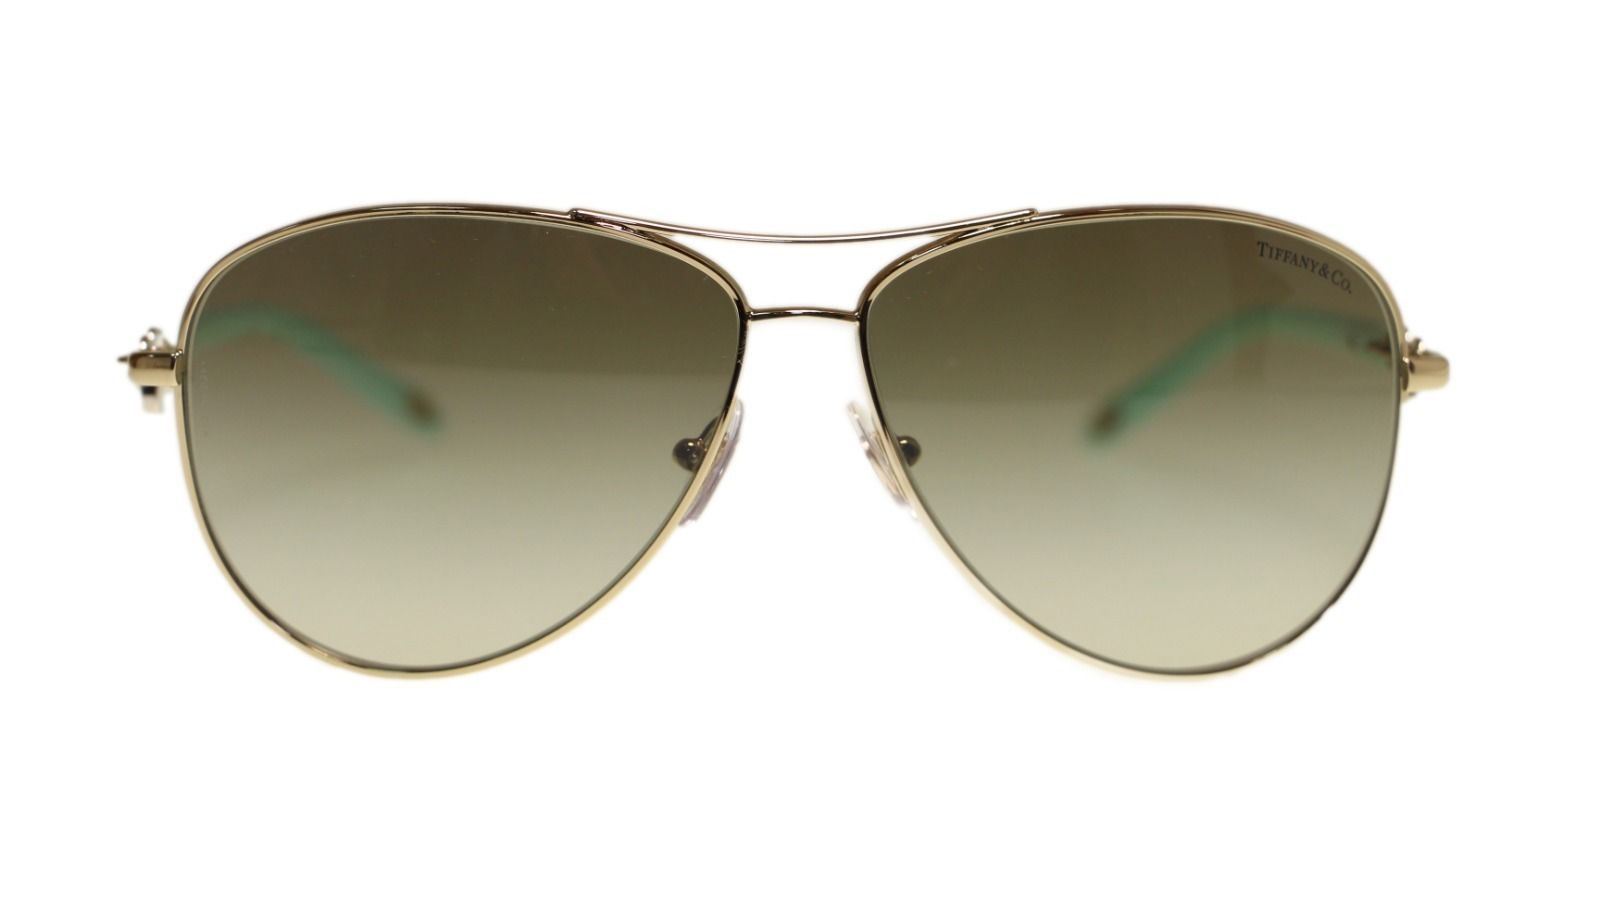 b4fcdbd1af6c NWT TIFFANY   CO. Sunglasses TF 3034 6021 3M Pale Gold   Green Gradient